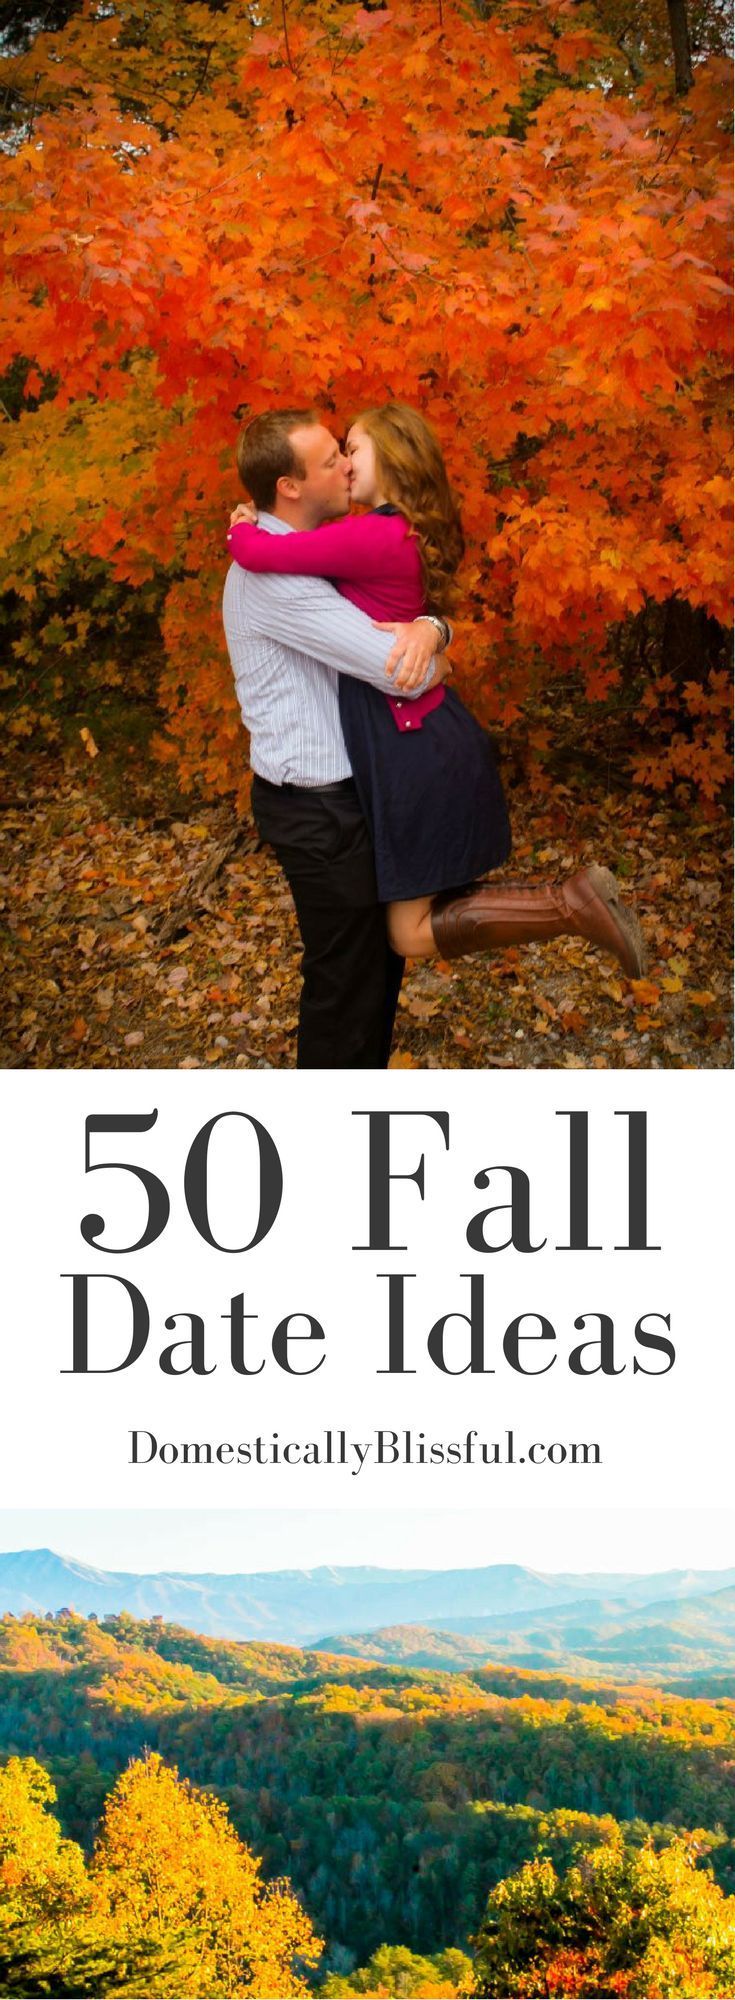 A list of fun & romantic fall date ideas that will last you all season!